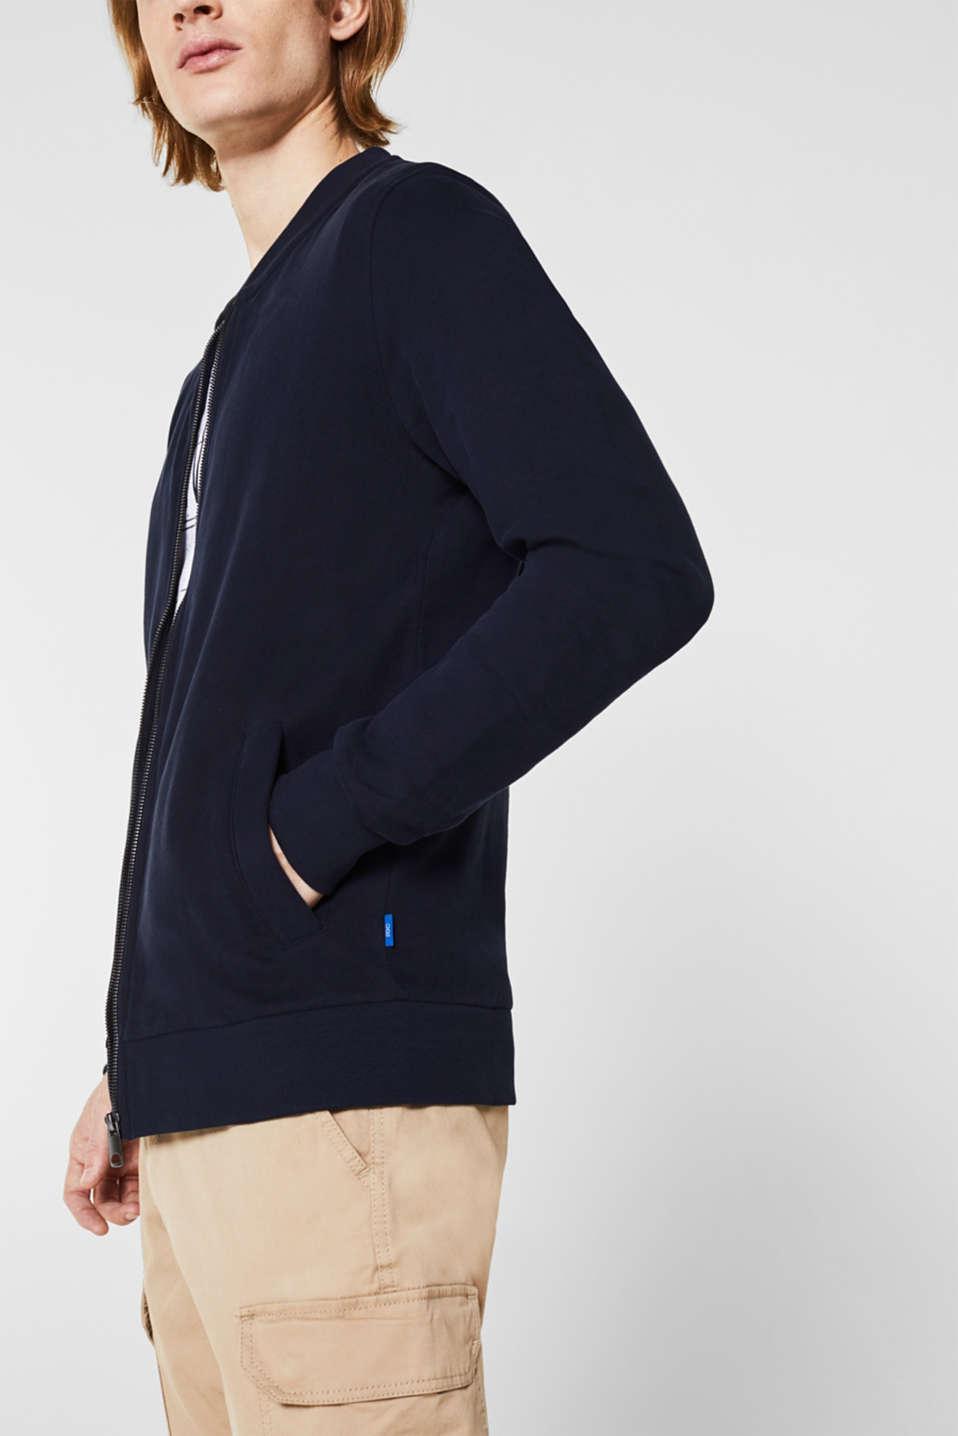 Bomber-style sweatshirt jacket, 100% cotton, NAVY, detail image number 2